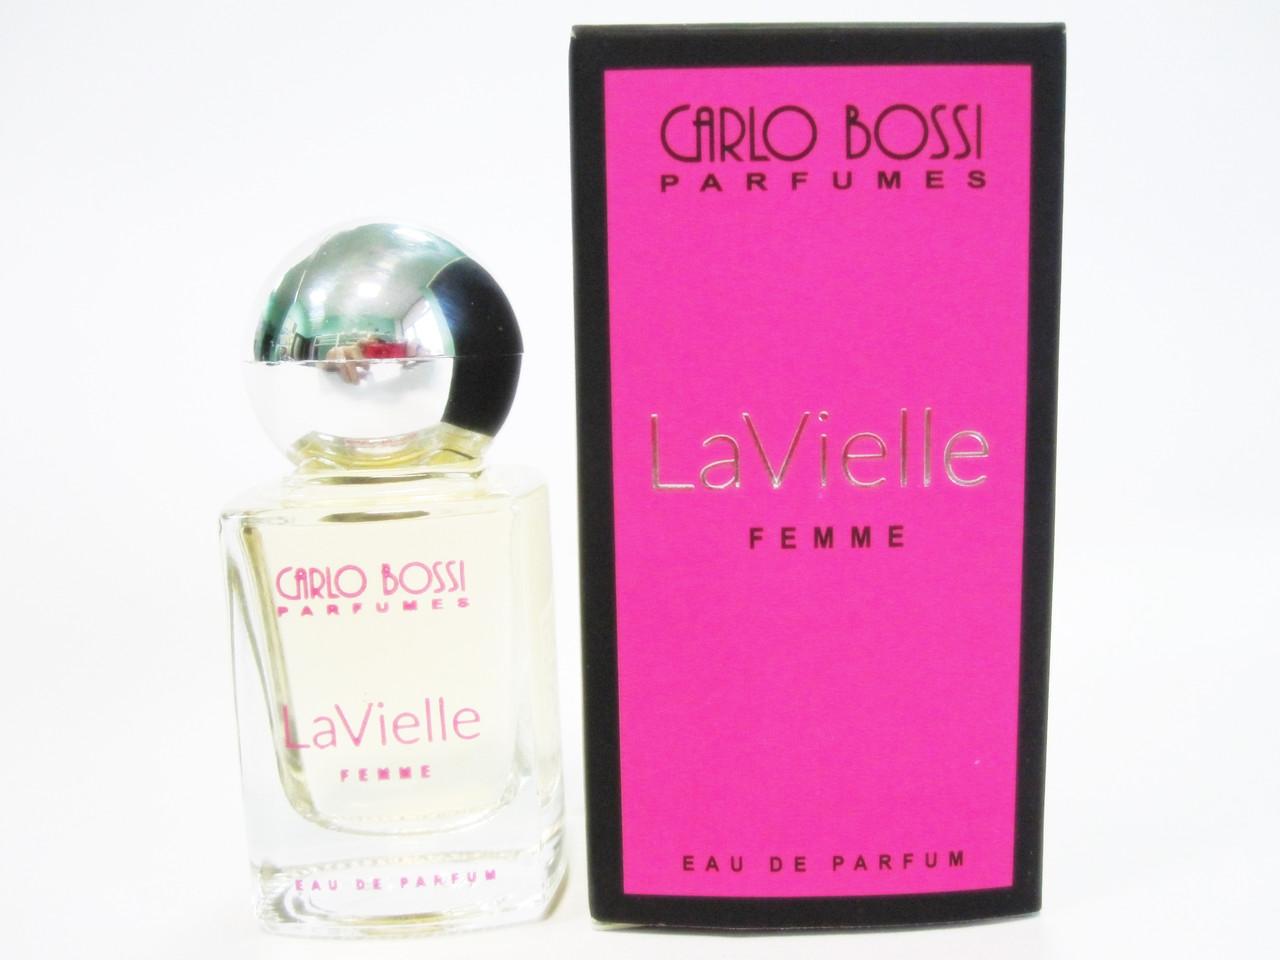 Парфюмерная вода для женщин Carlo Bossi LaVielle Black мини 10 мл (01020172001)